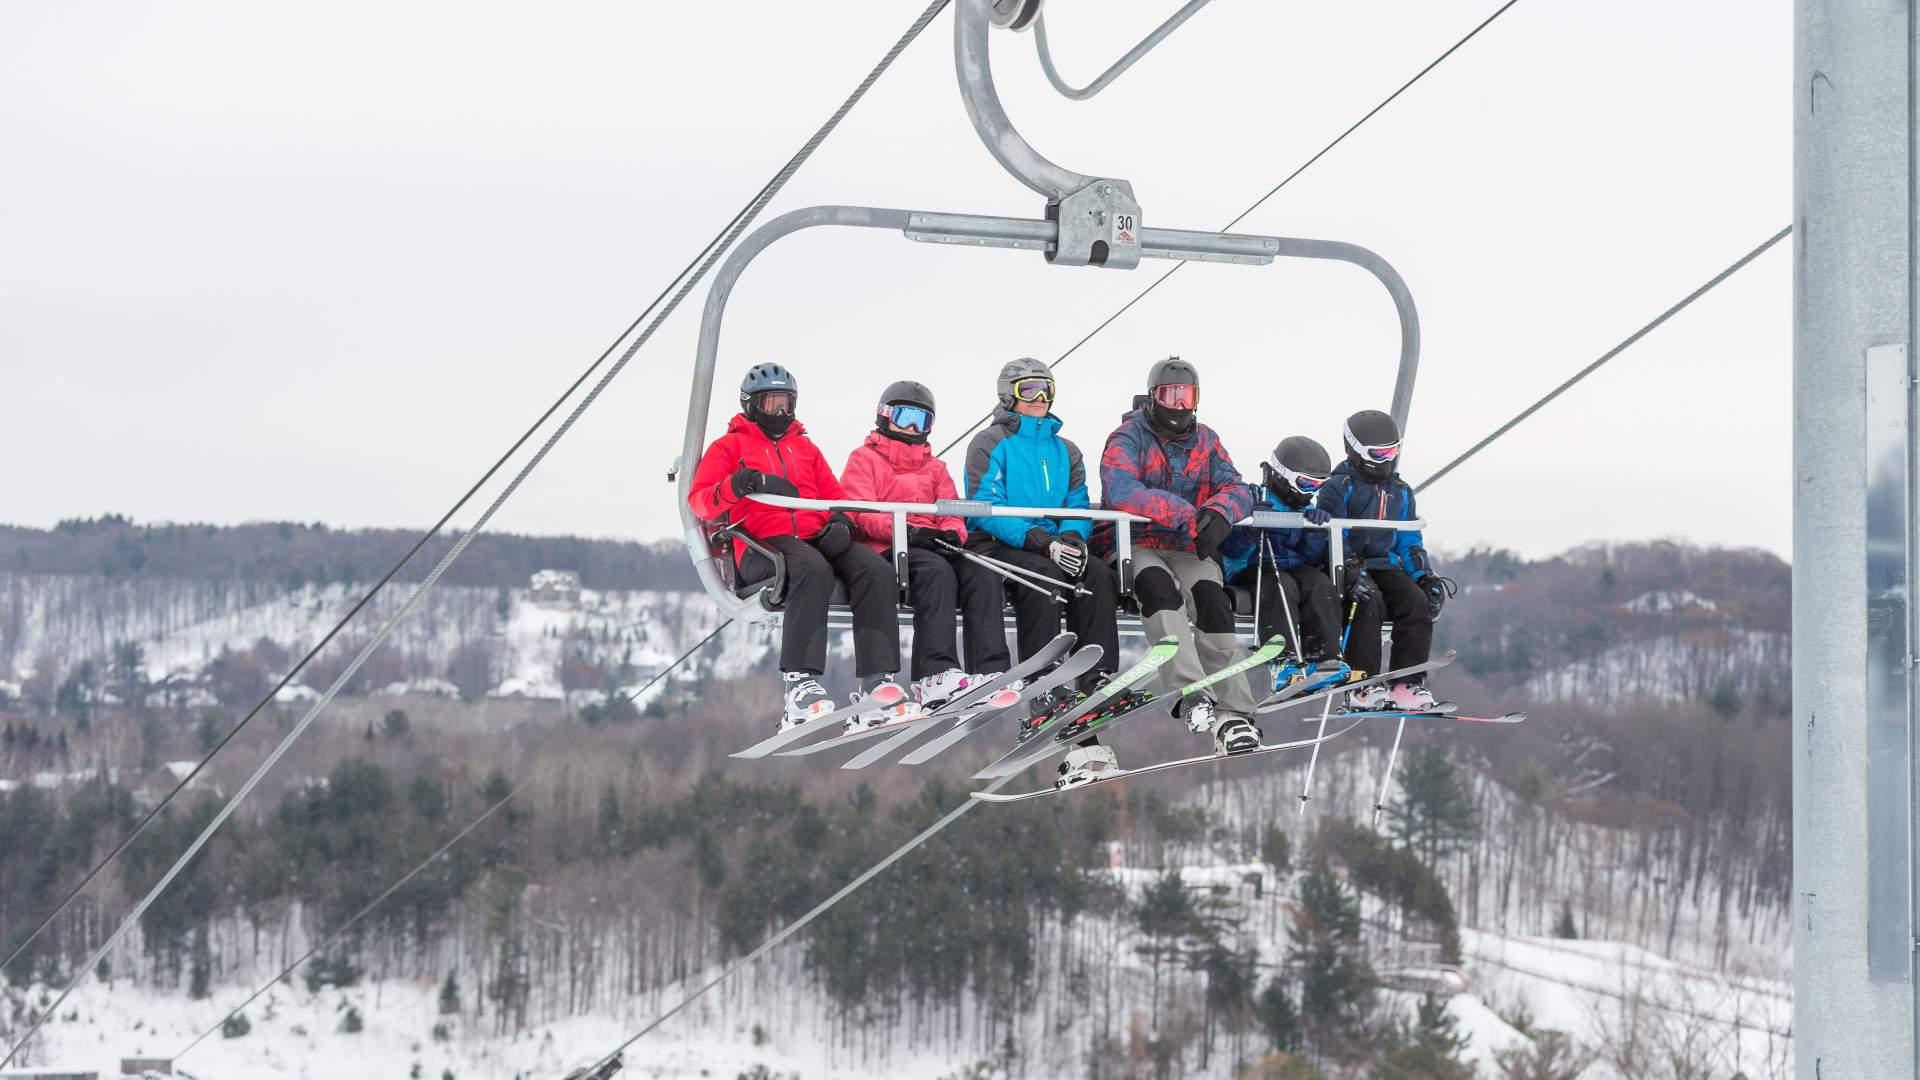 ski & stay this winter